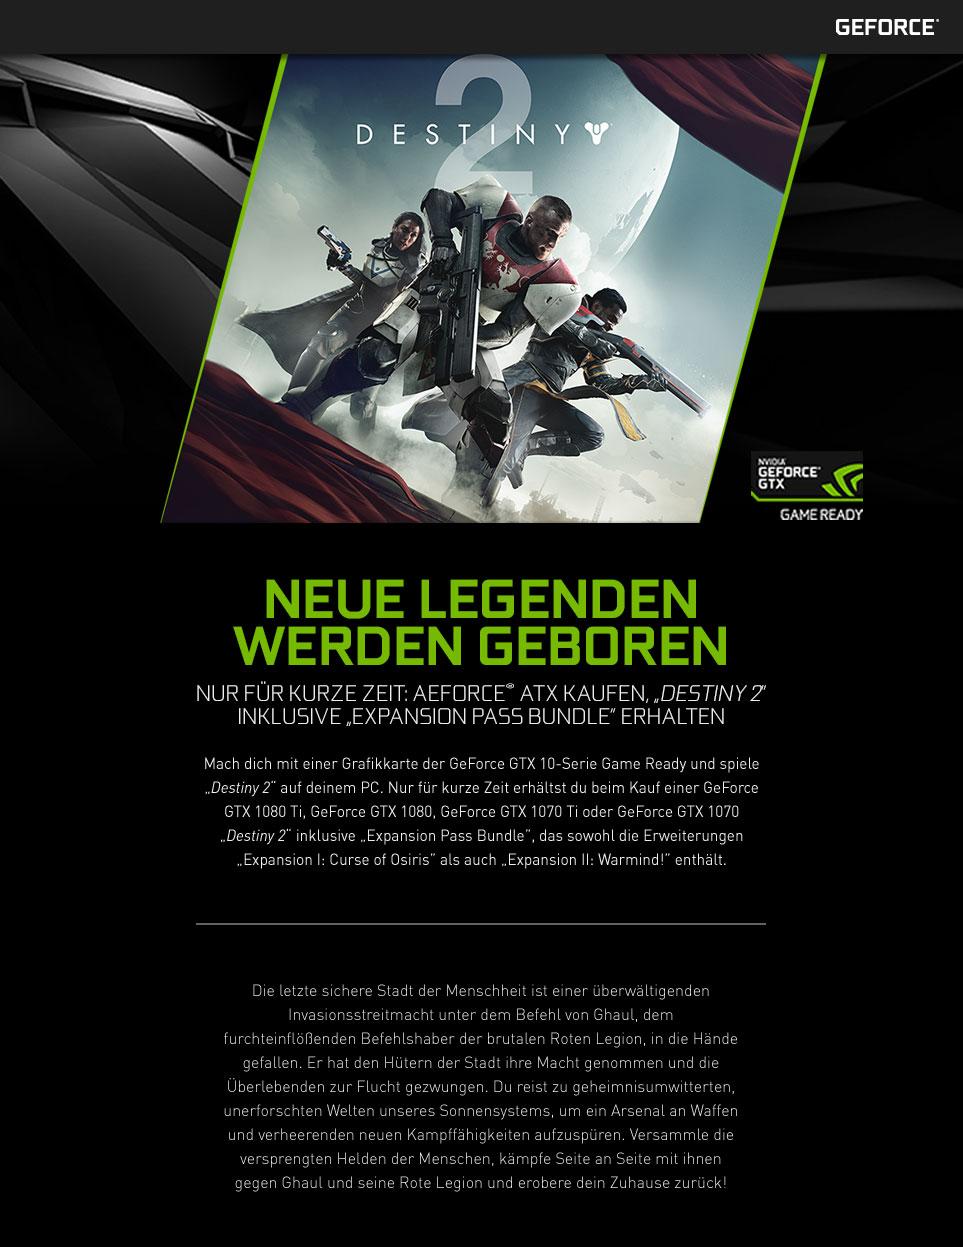 NVIDIA GeForce Destiny 2